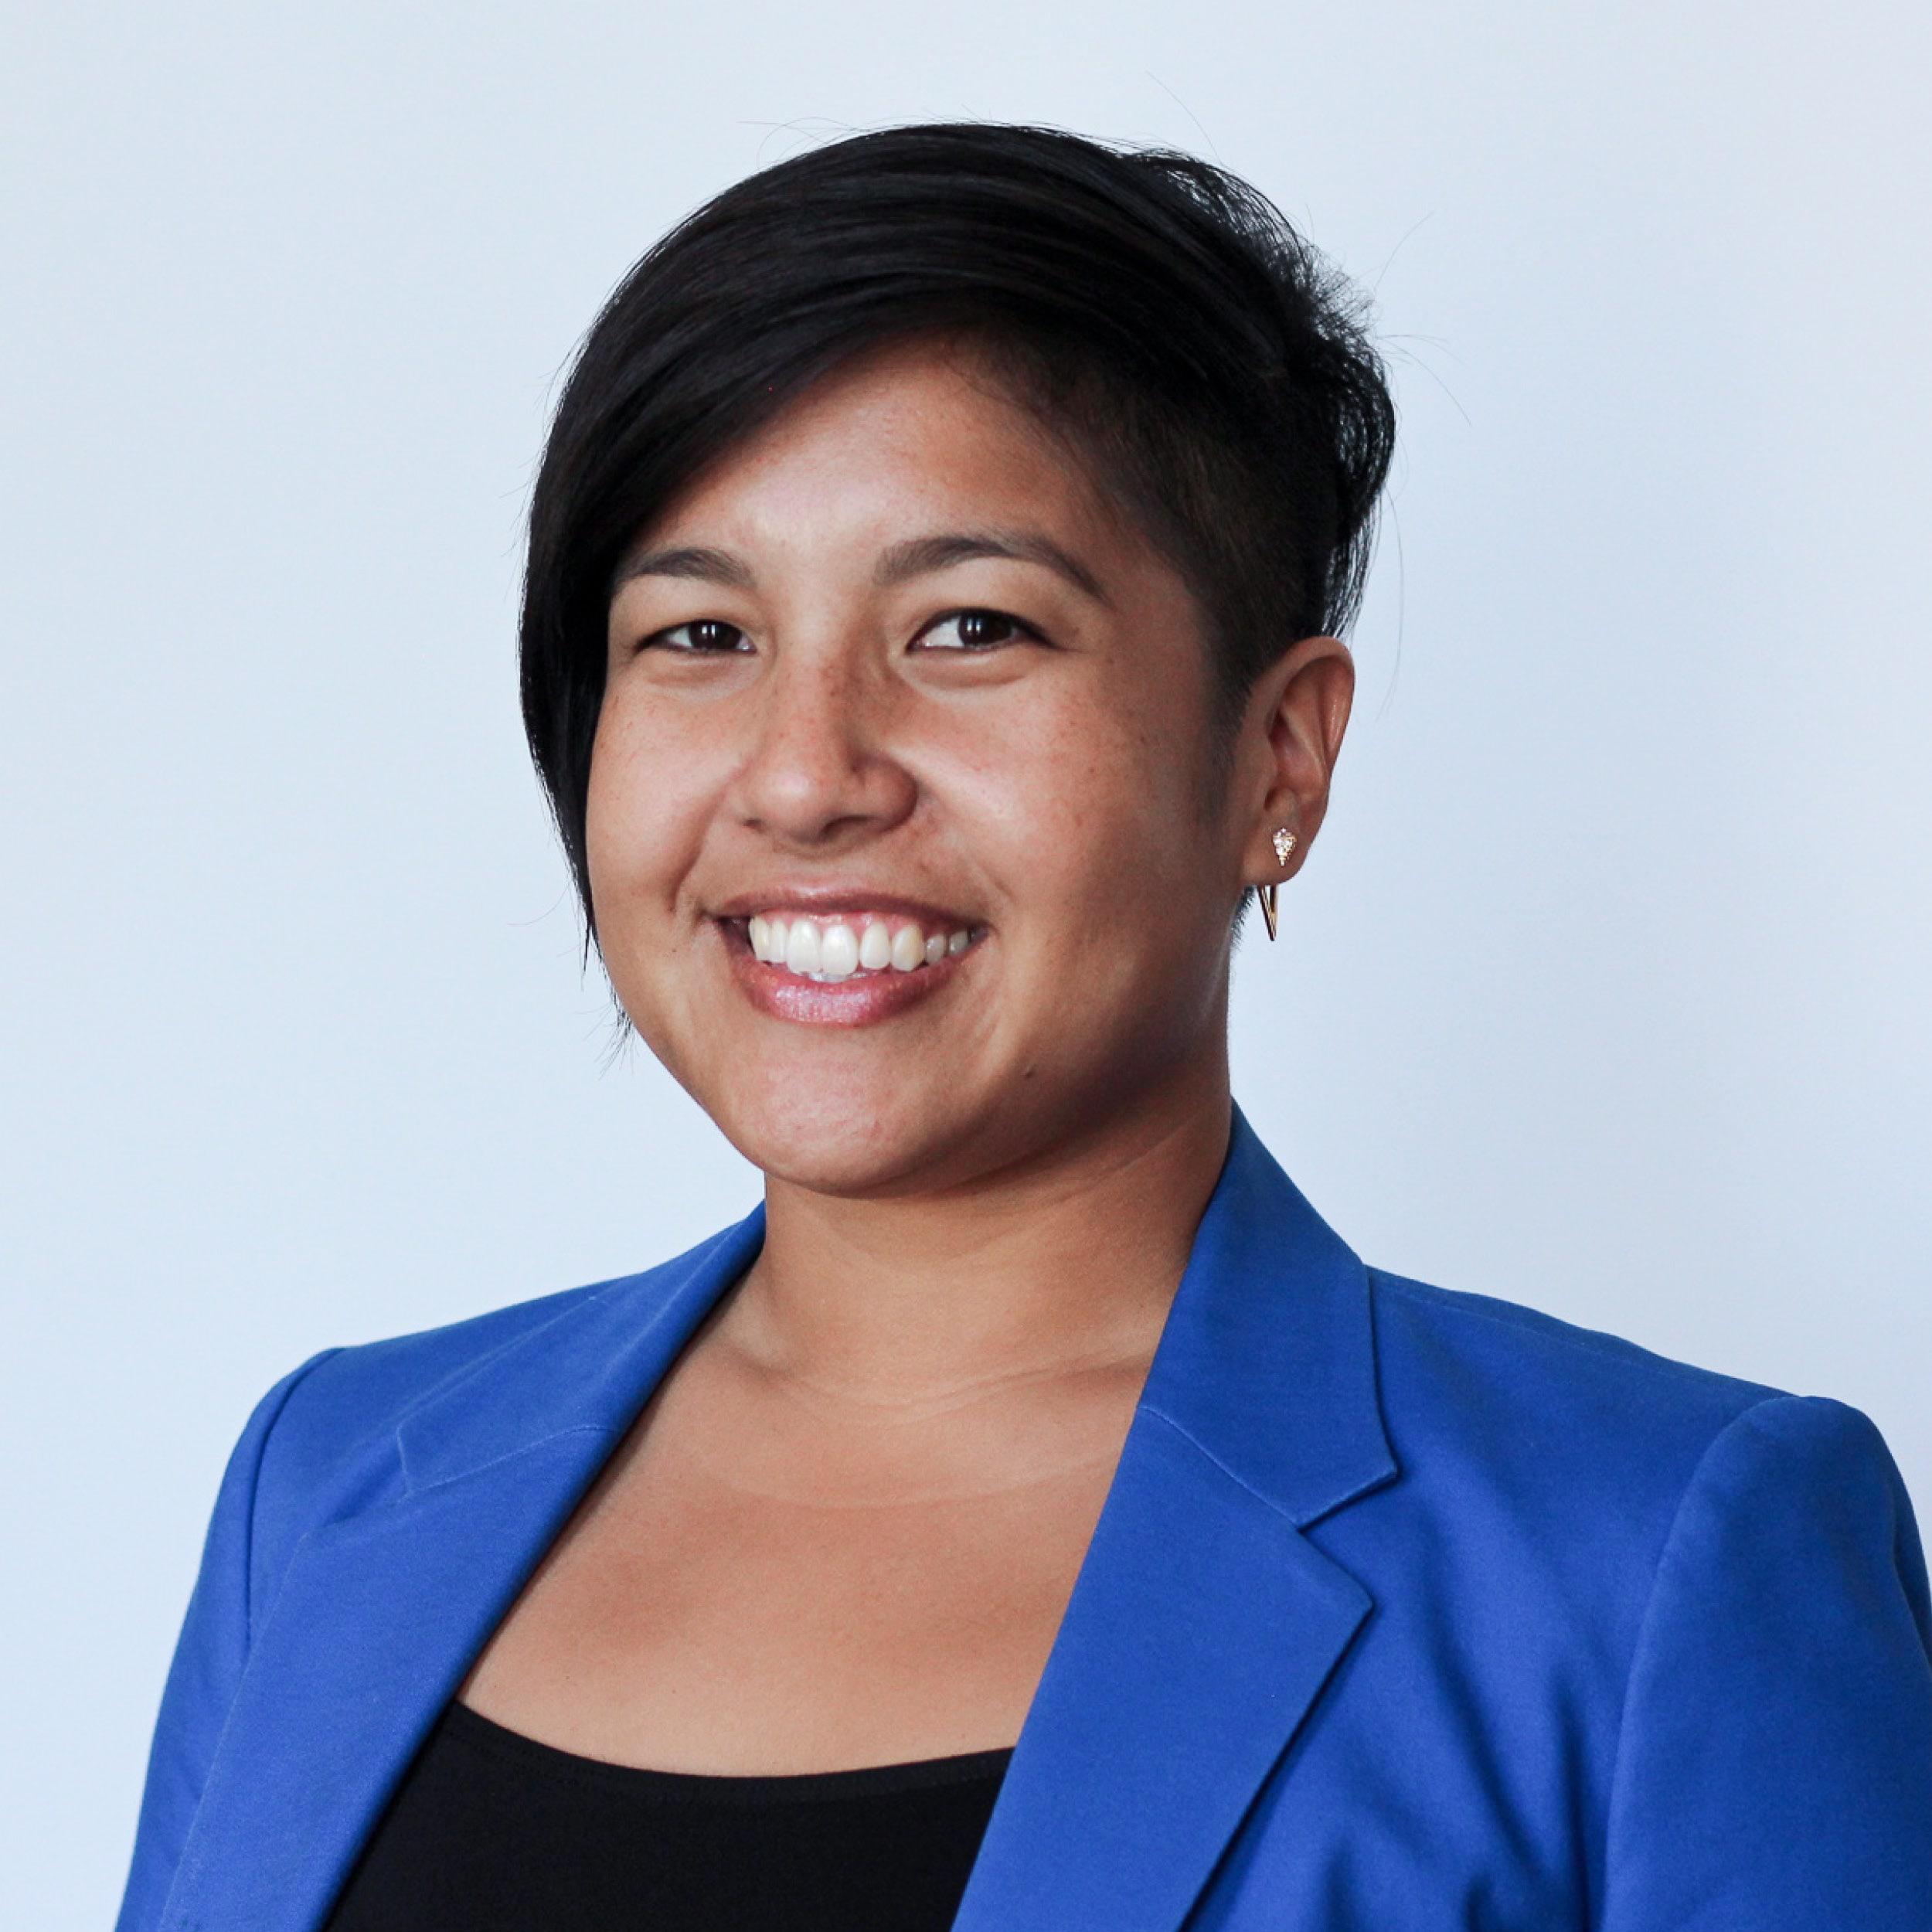 Samantha Seng